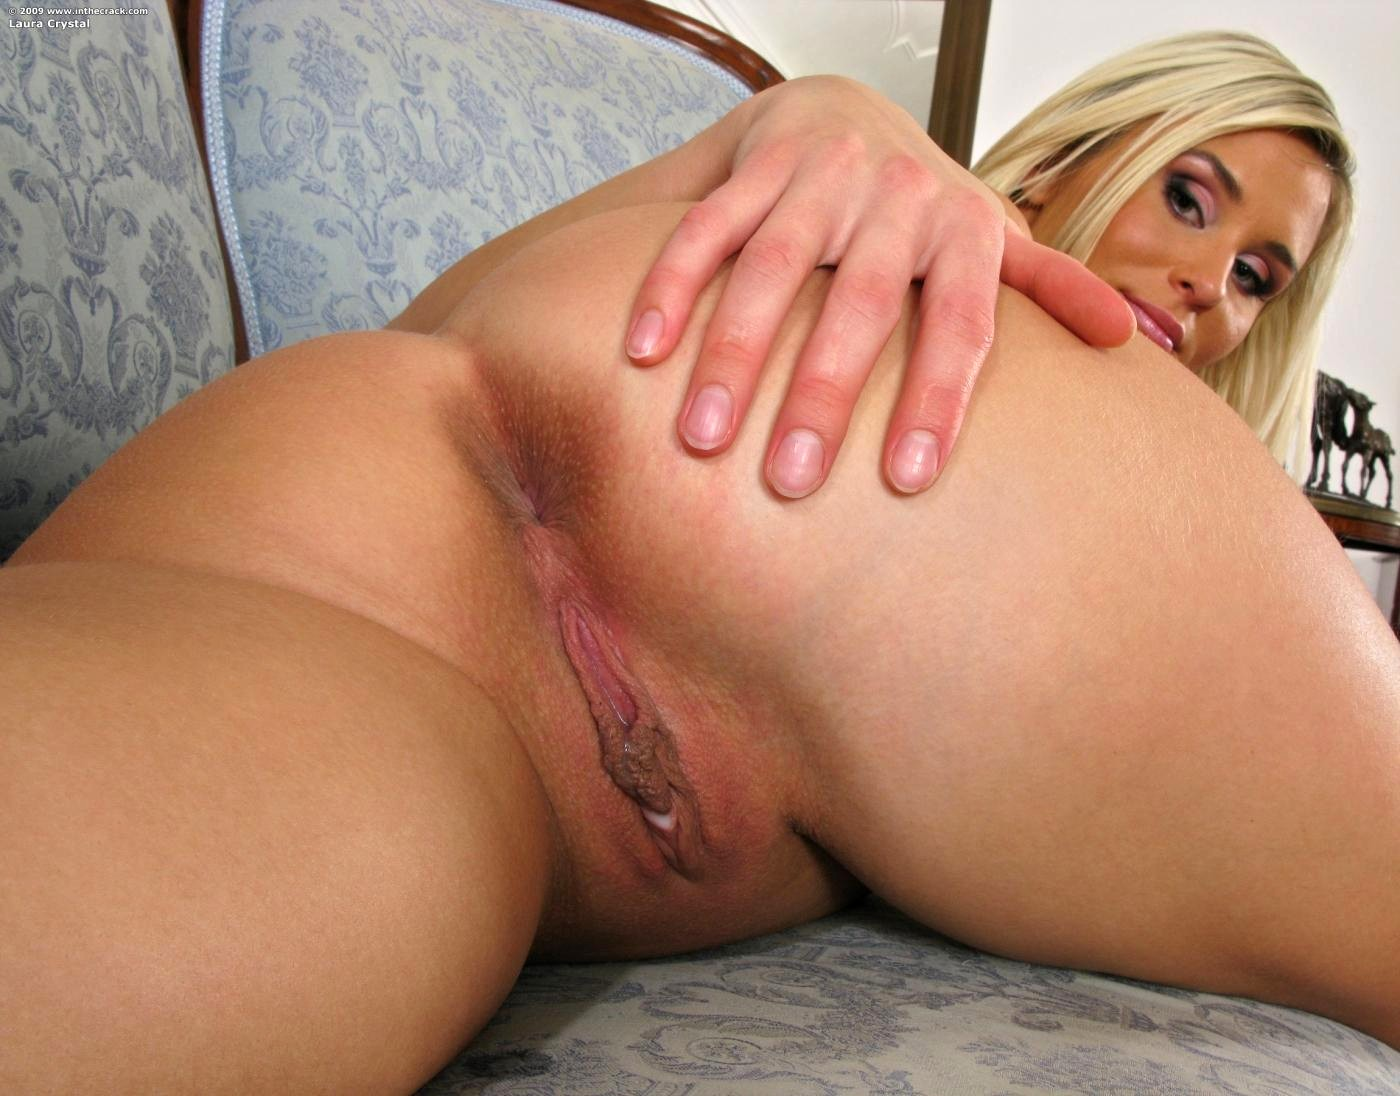 Myboobs Laura Orsolya Woman Pussy Cumblast Yes Porn Pics Xxx